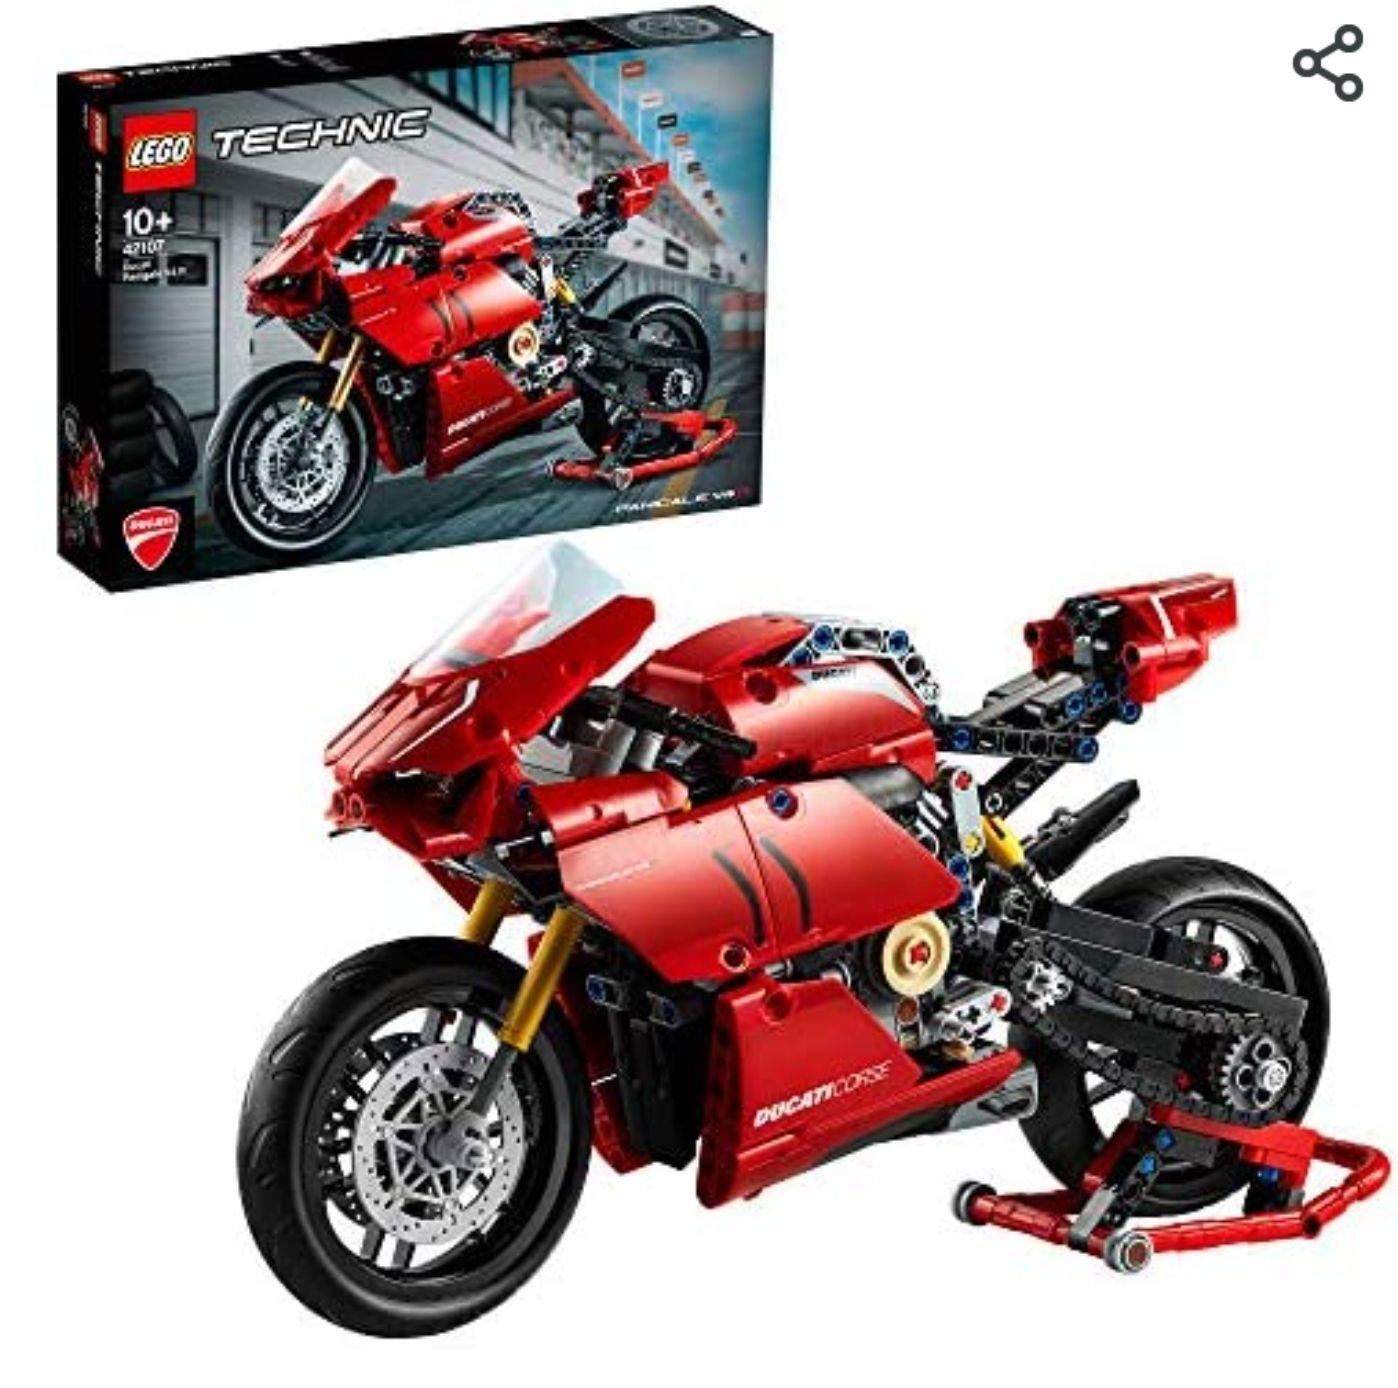 LEGO Technic 42107 Ducatti Panigale V4 R Motorbike £40.21 Amazon